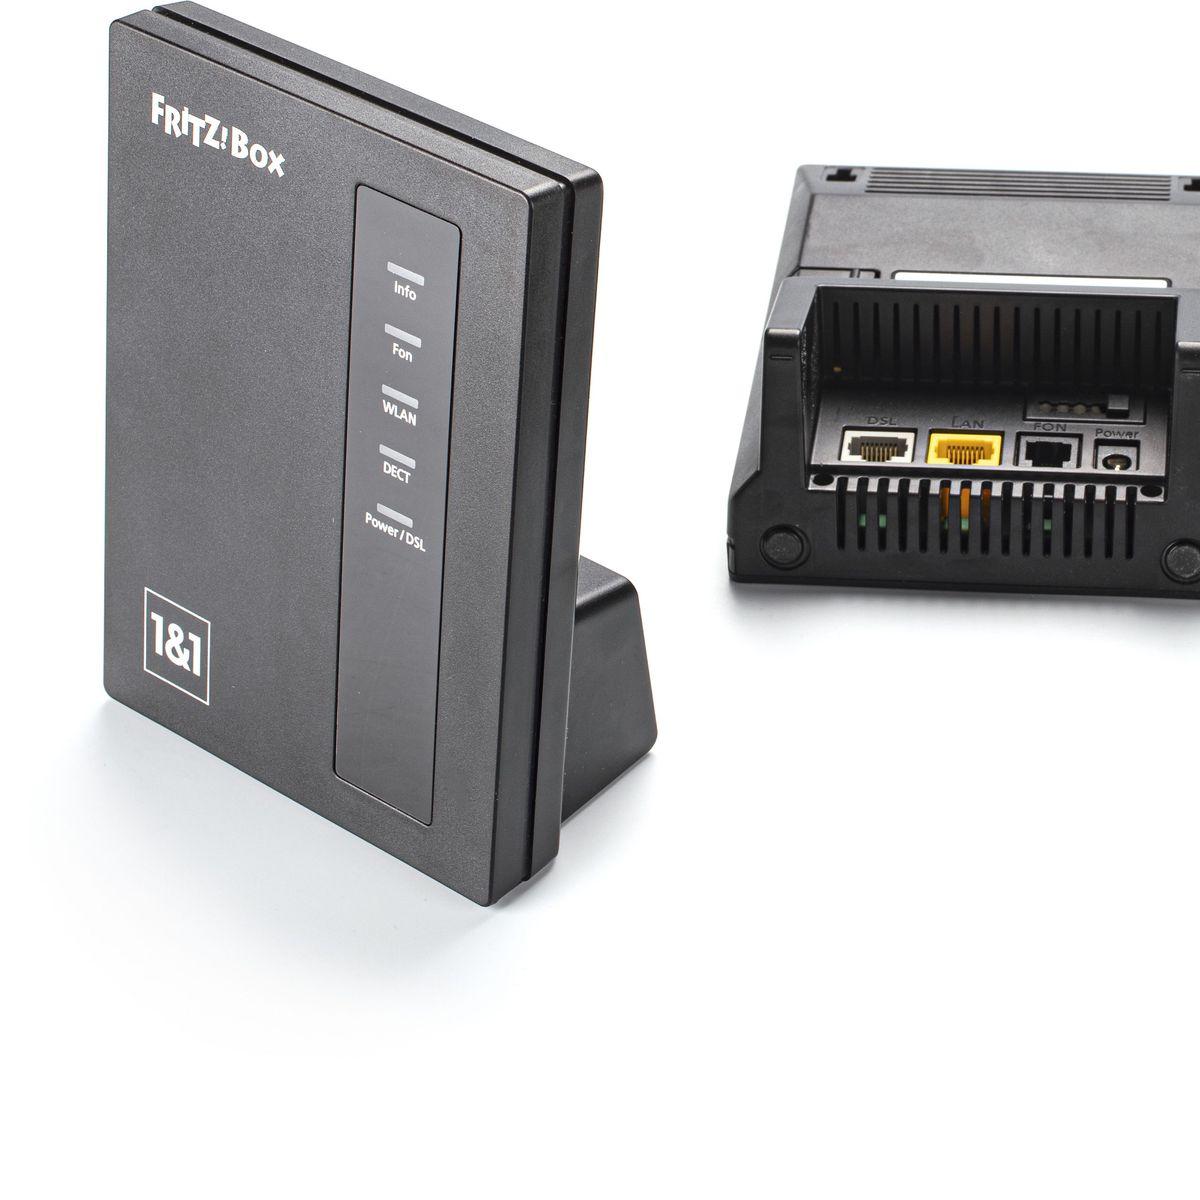 Fritzbox 10 als DSL-Modem, DECT-Basis und Ersatzrouter